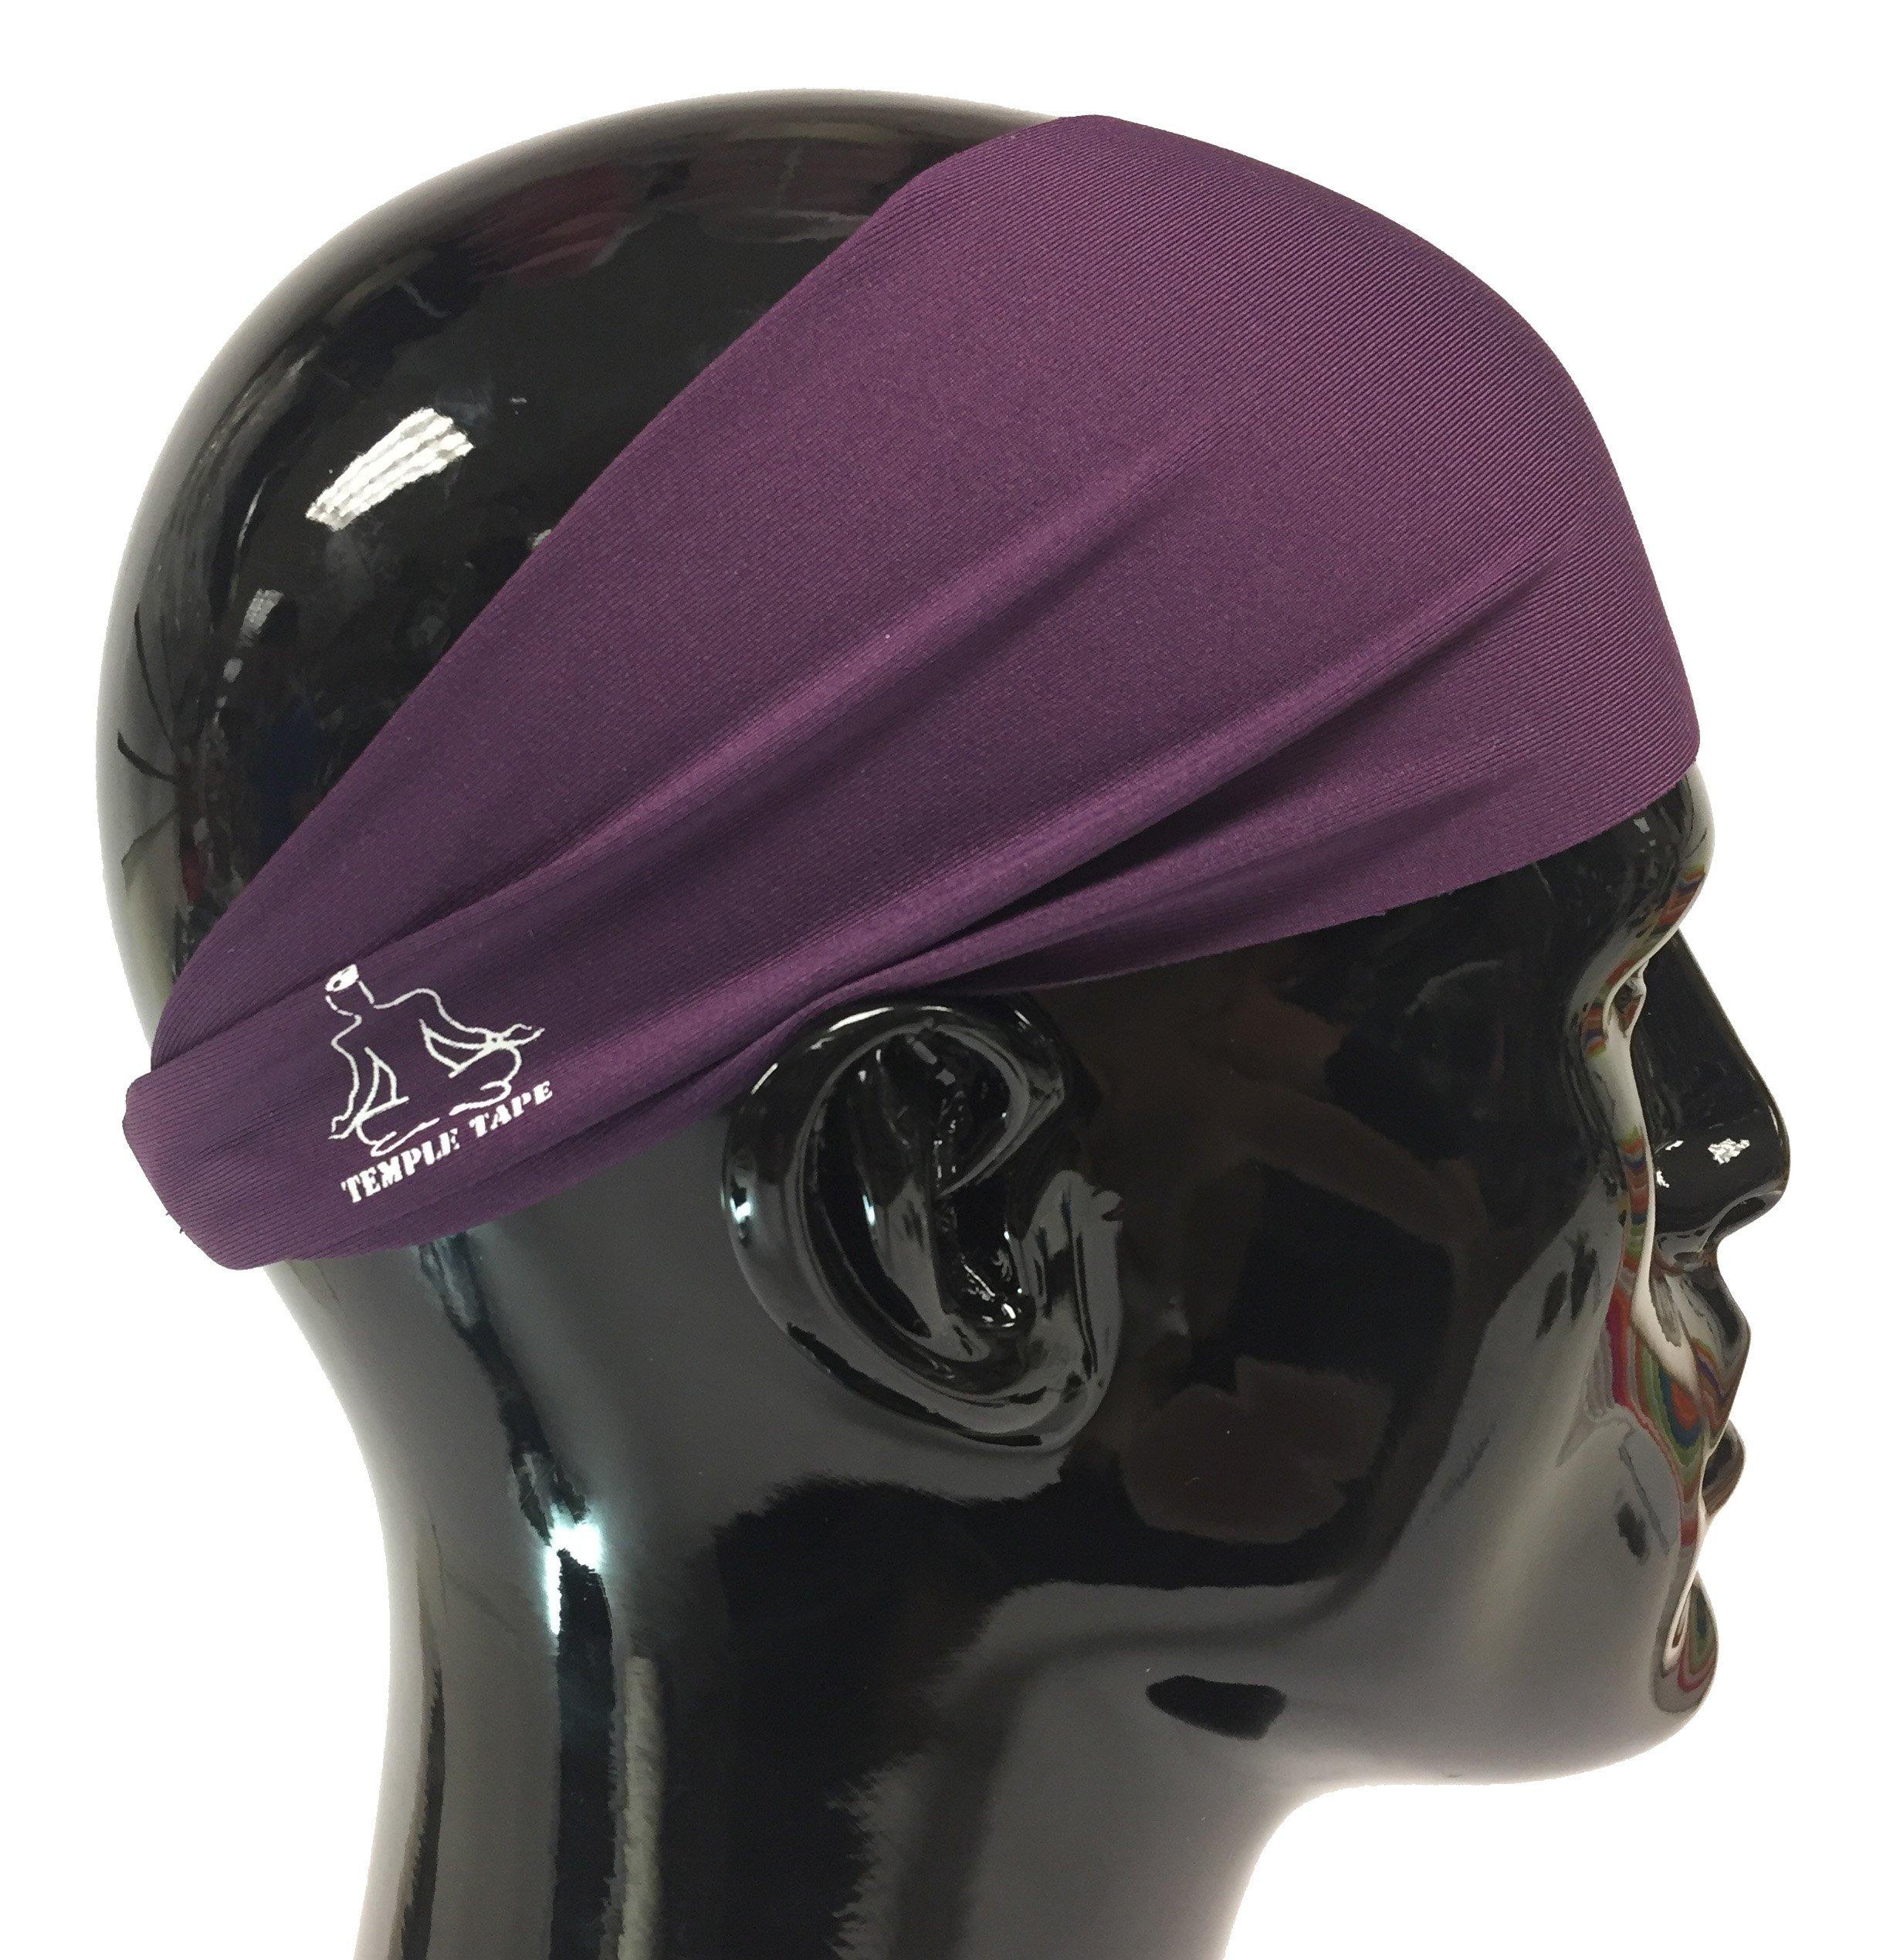 Temple Tape Headbands for Men and Women - Mens Sweatband & Sports Headband Moisture Wicking Workout Sweatbands for Running, Cross Training, Yoga and Bike Helmet Friendly - Deep Purple